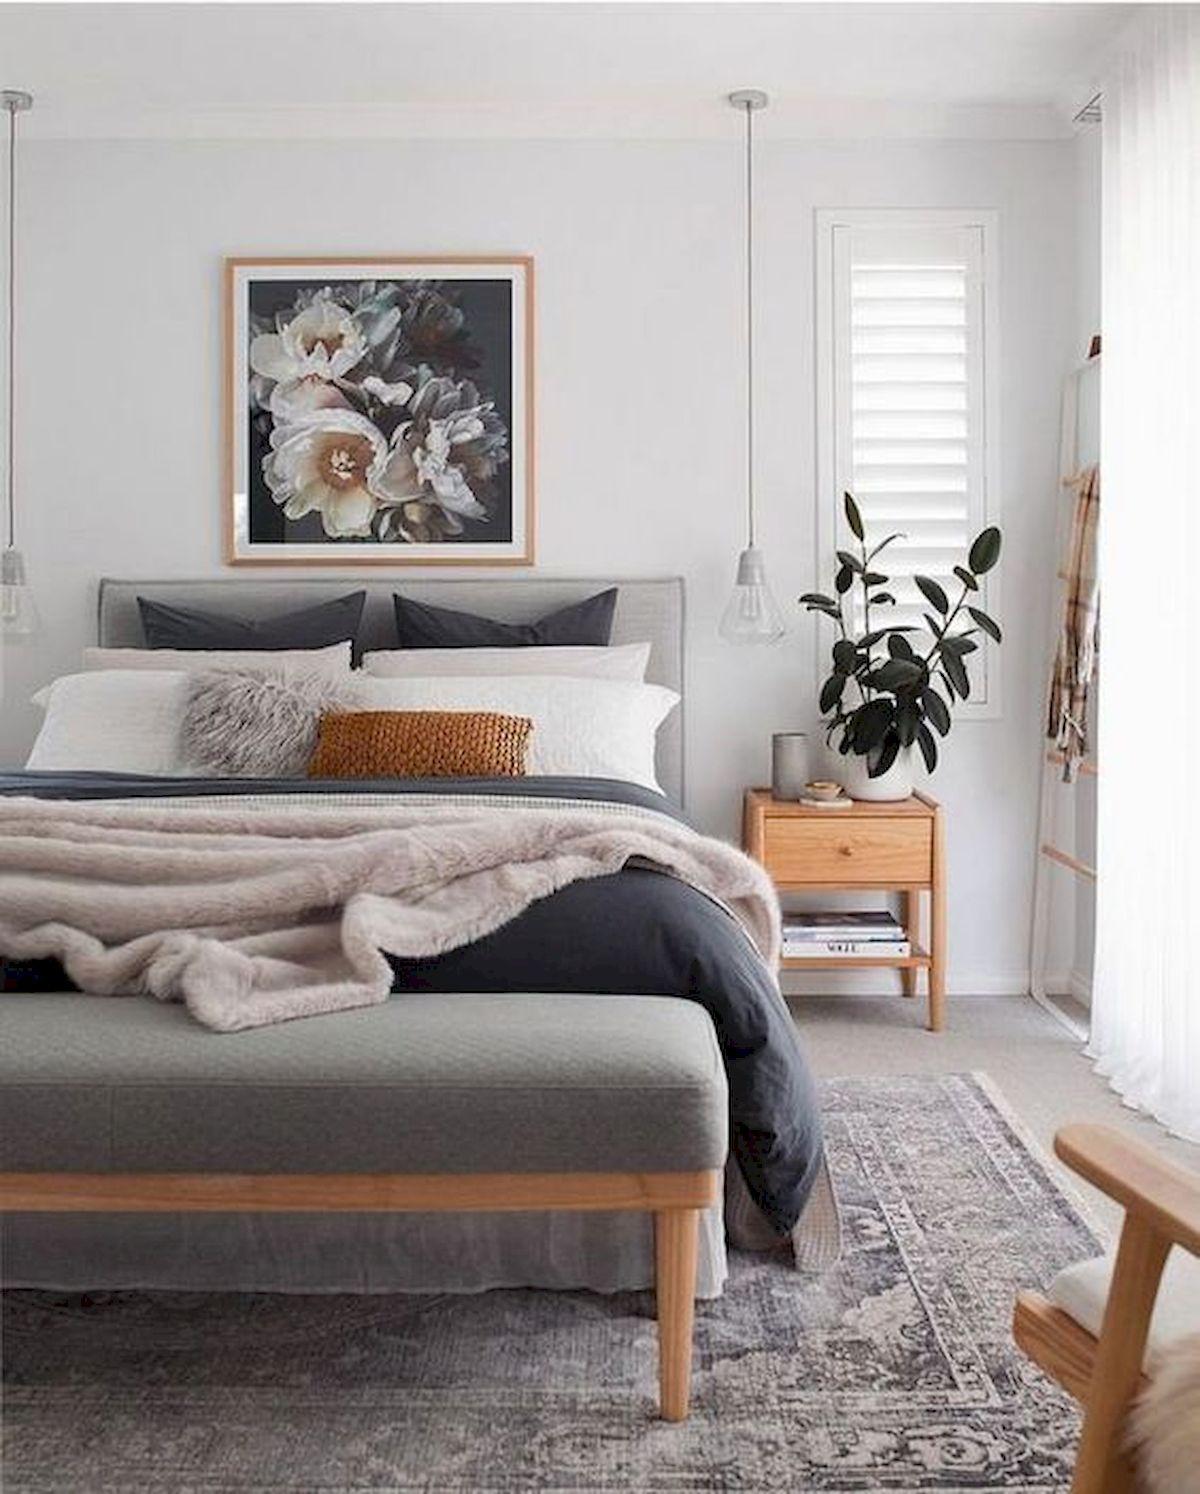 60 Beautiful Bedroom Decor and Design Ideas (29)